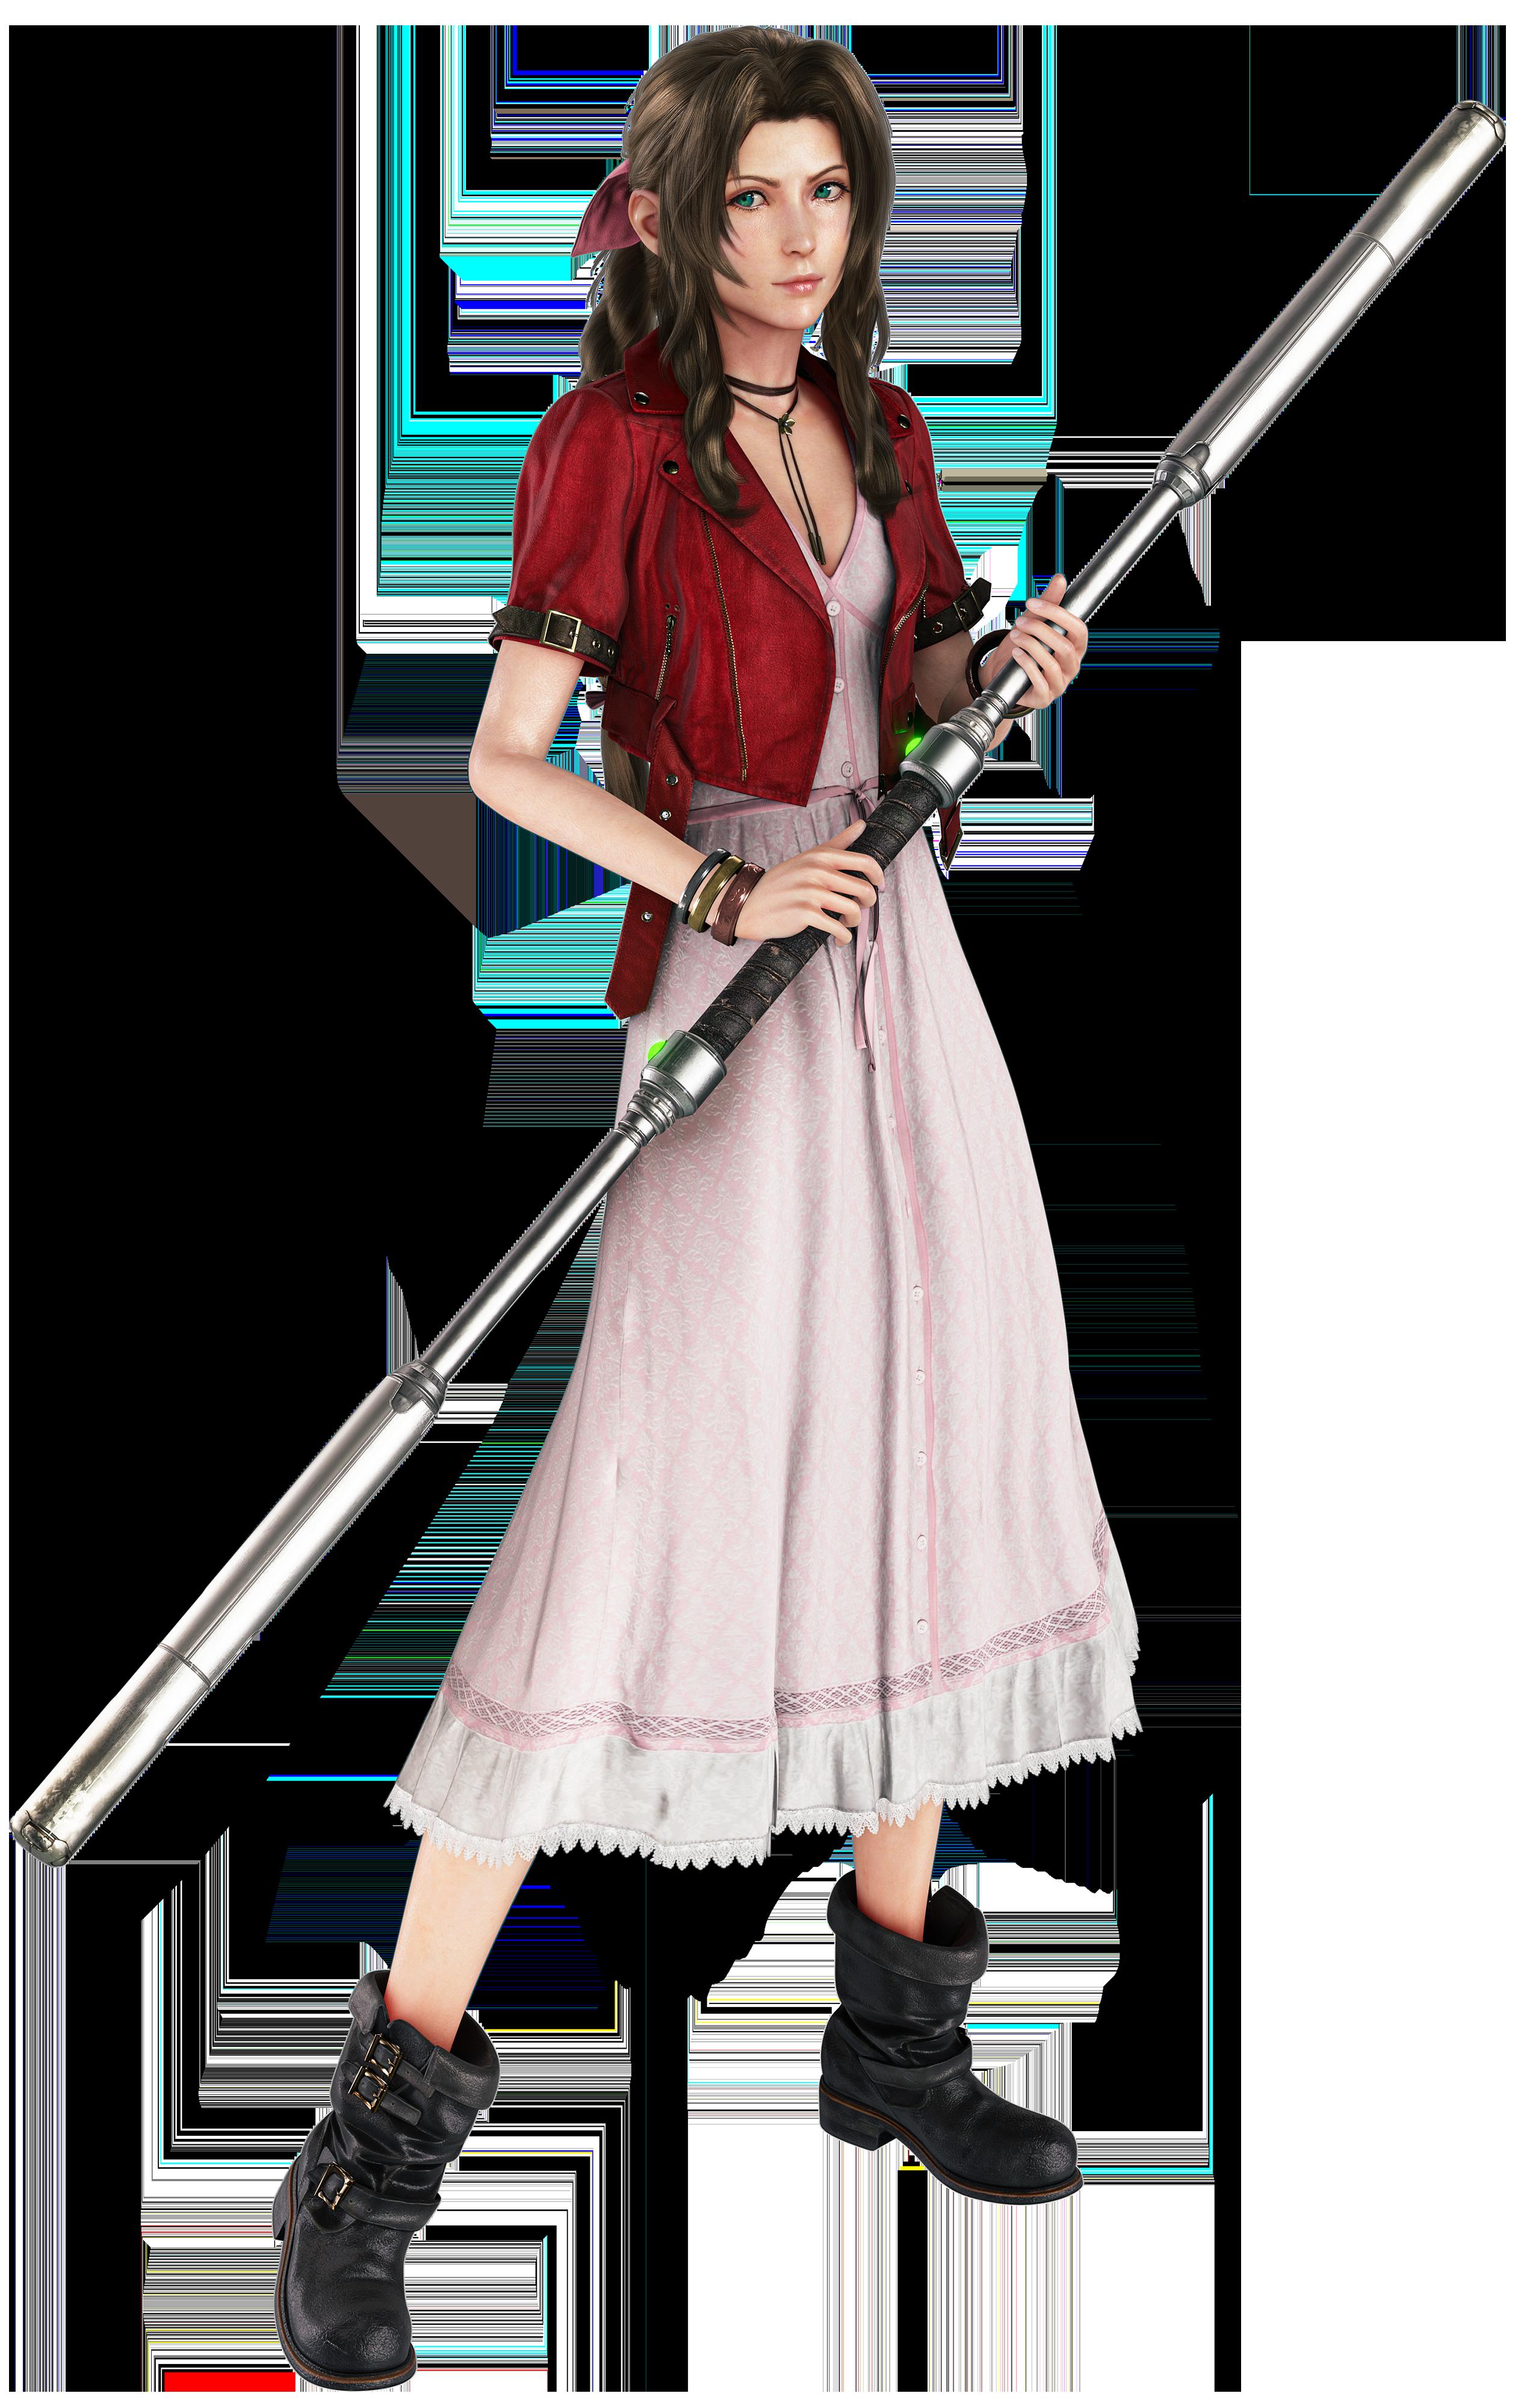 Aerith Gainsborough (VII Remake party member)